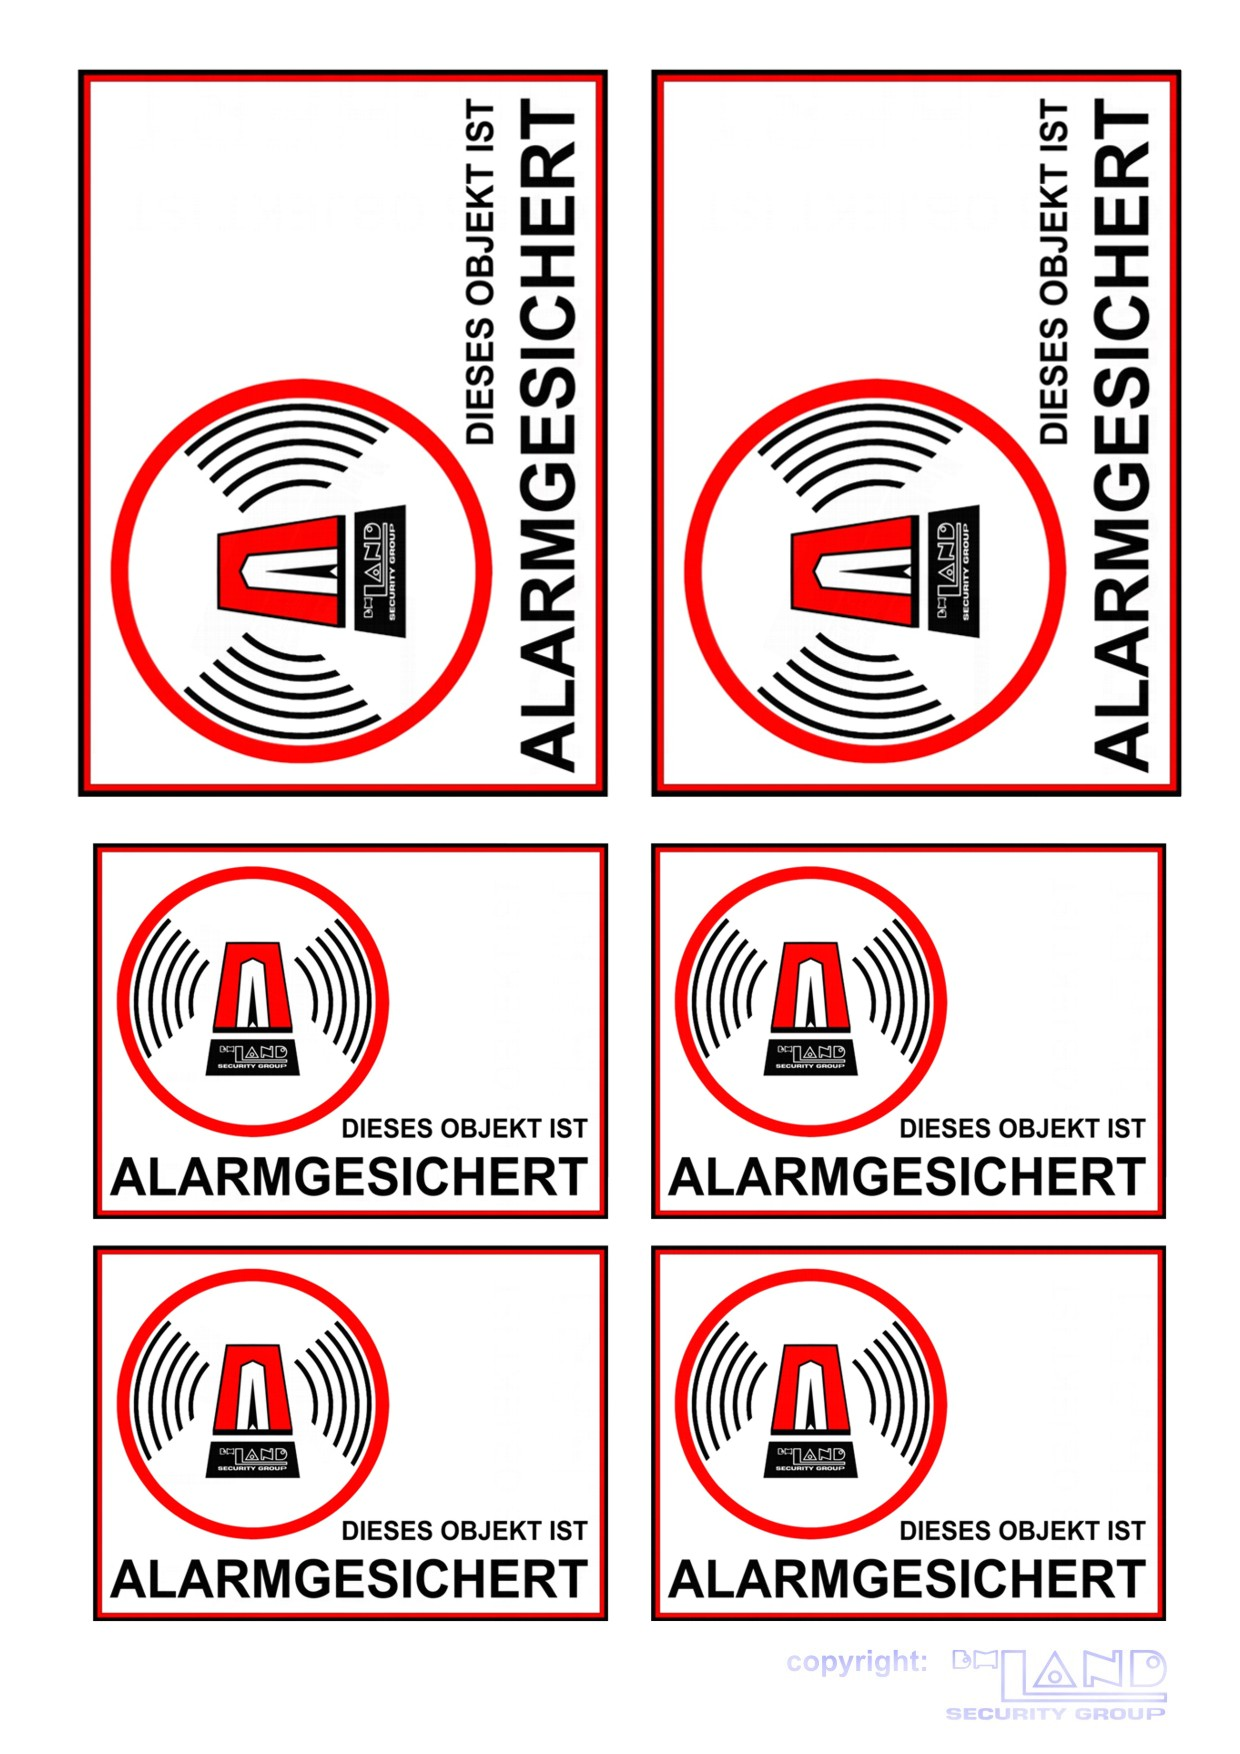 alarmgesichert-small